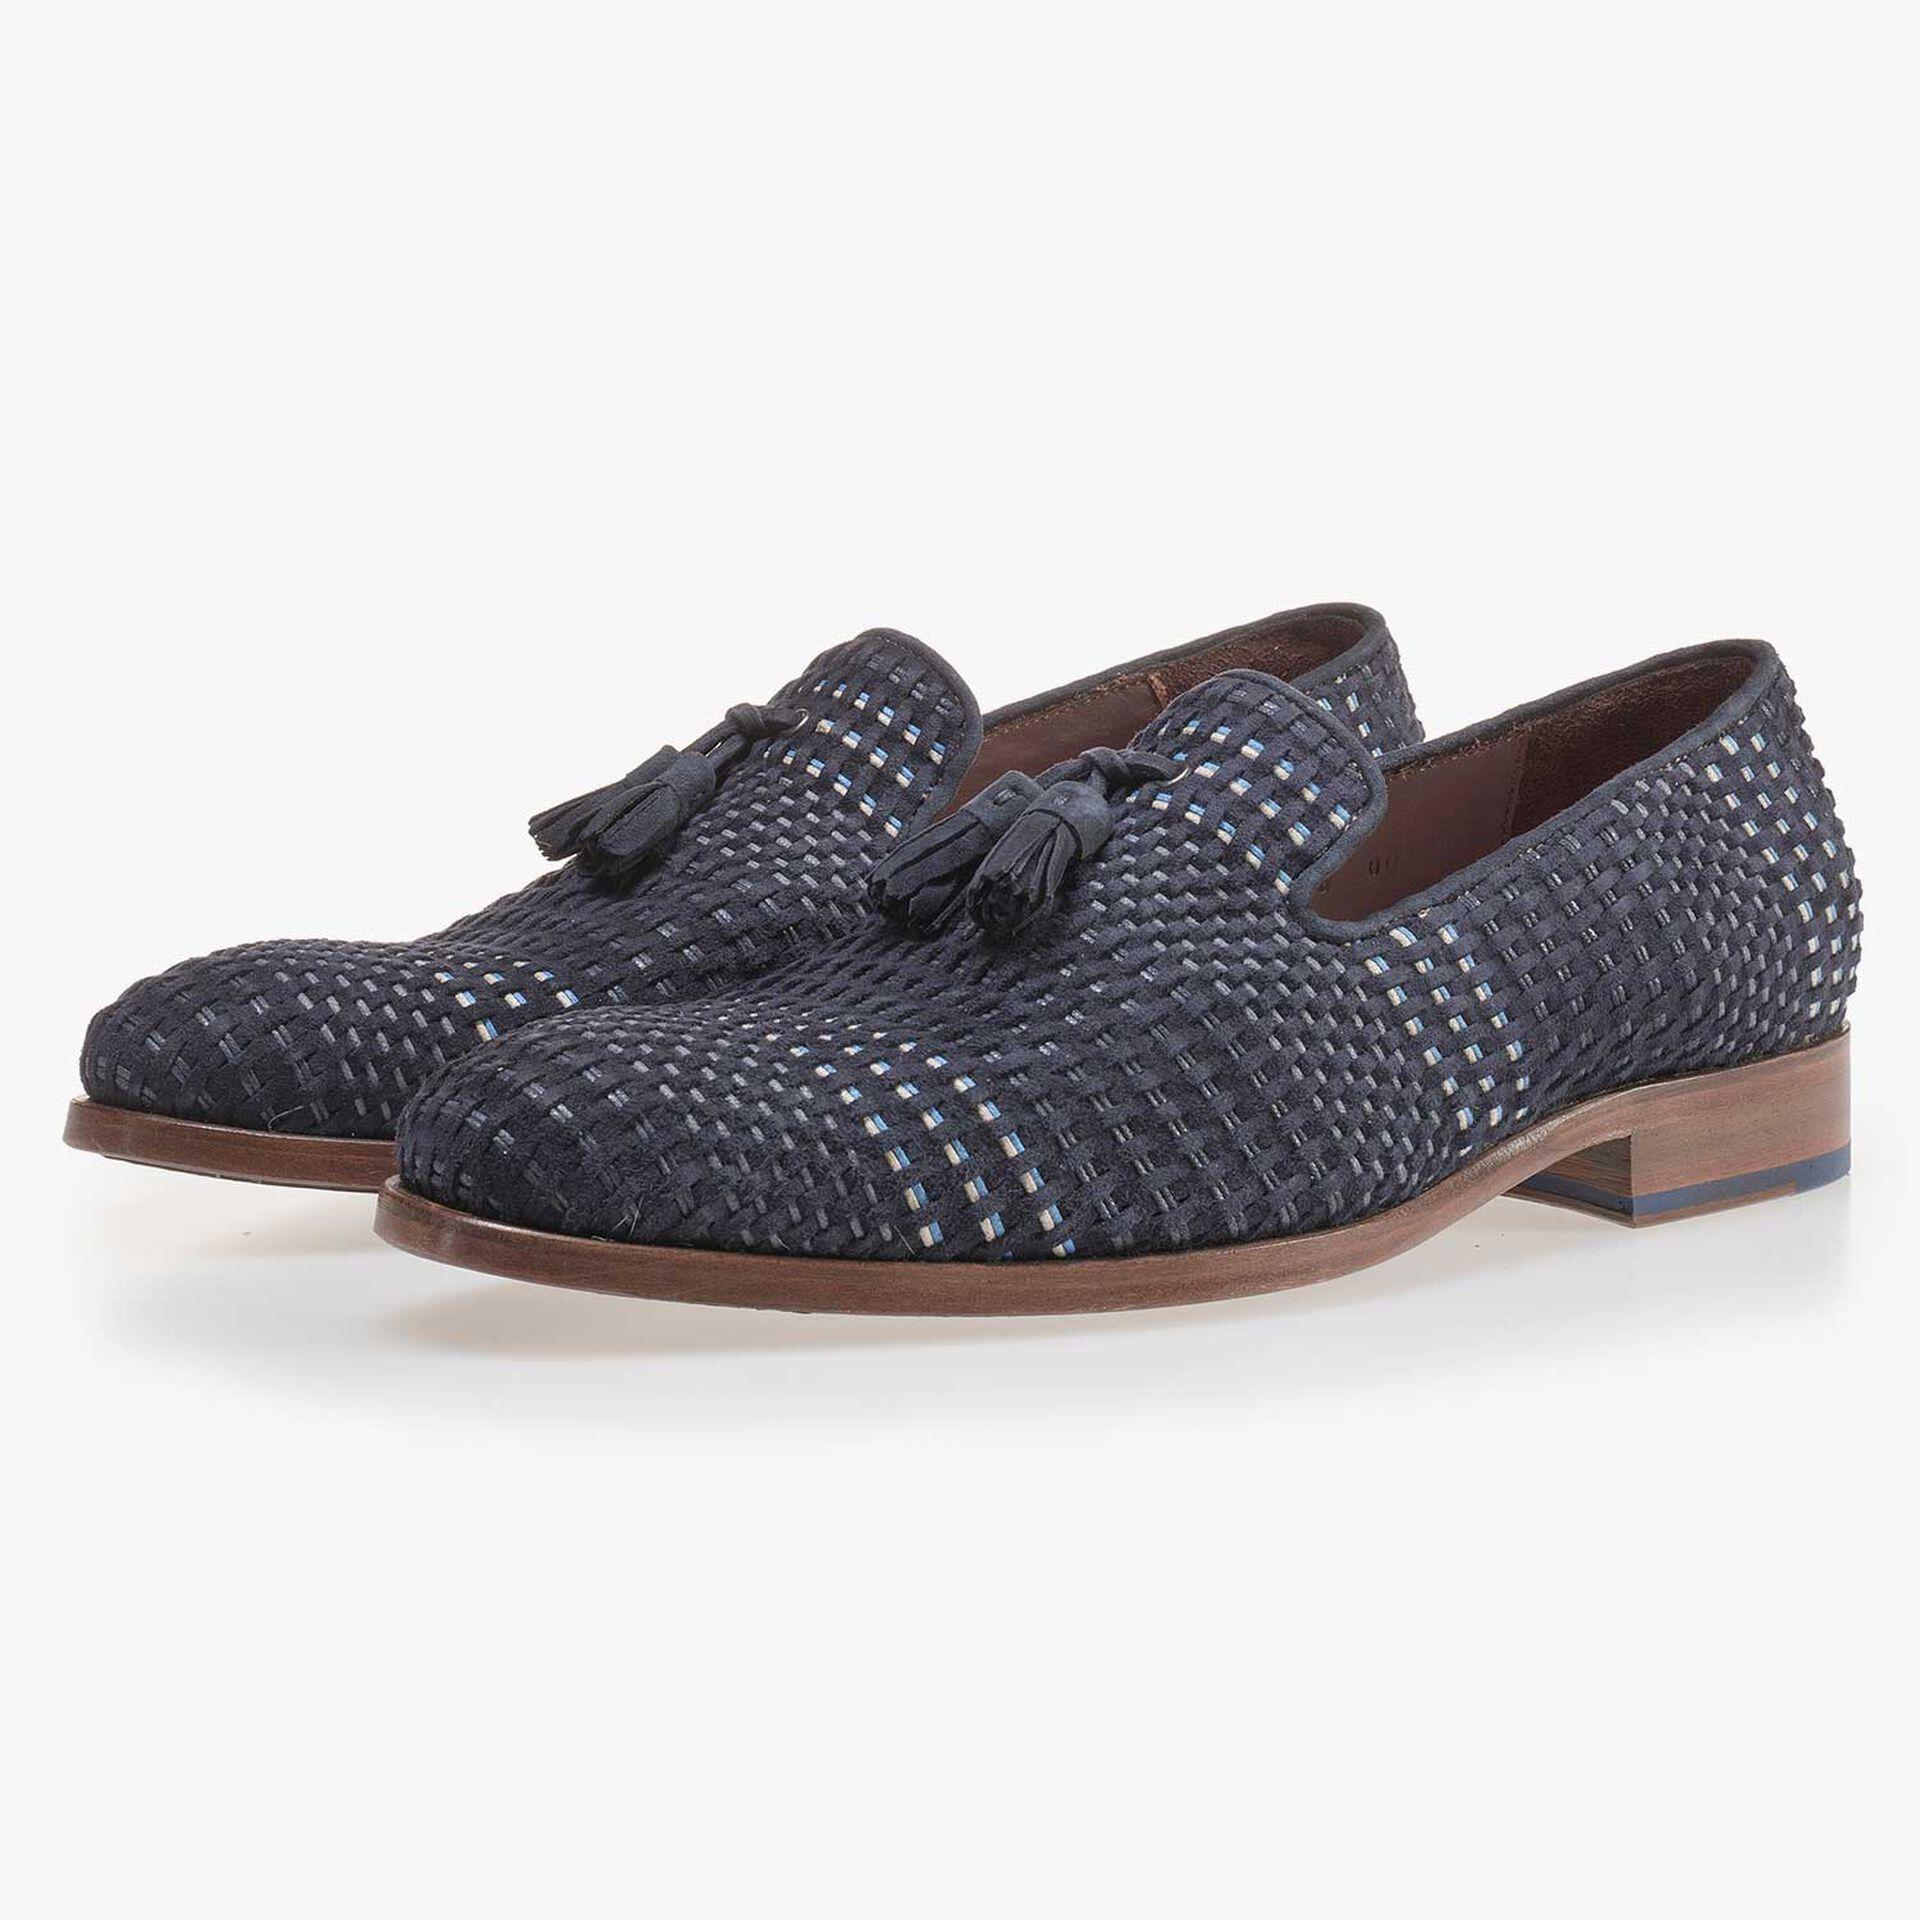 Dark blue braided suede leather loafer